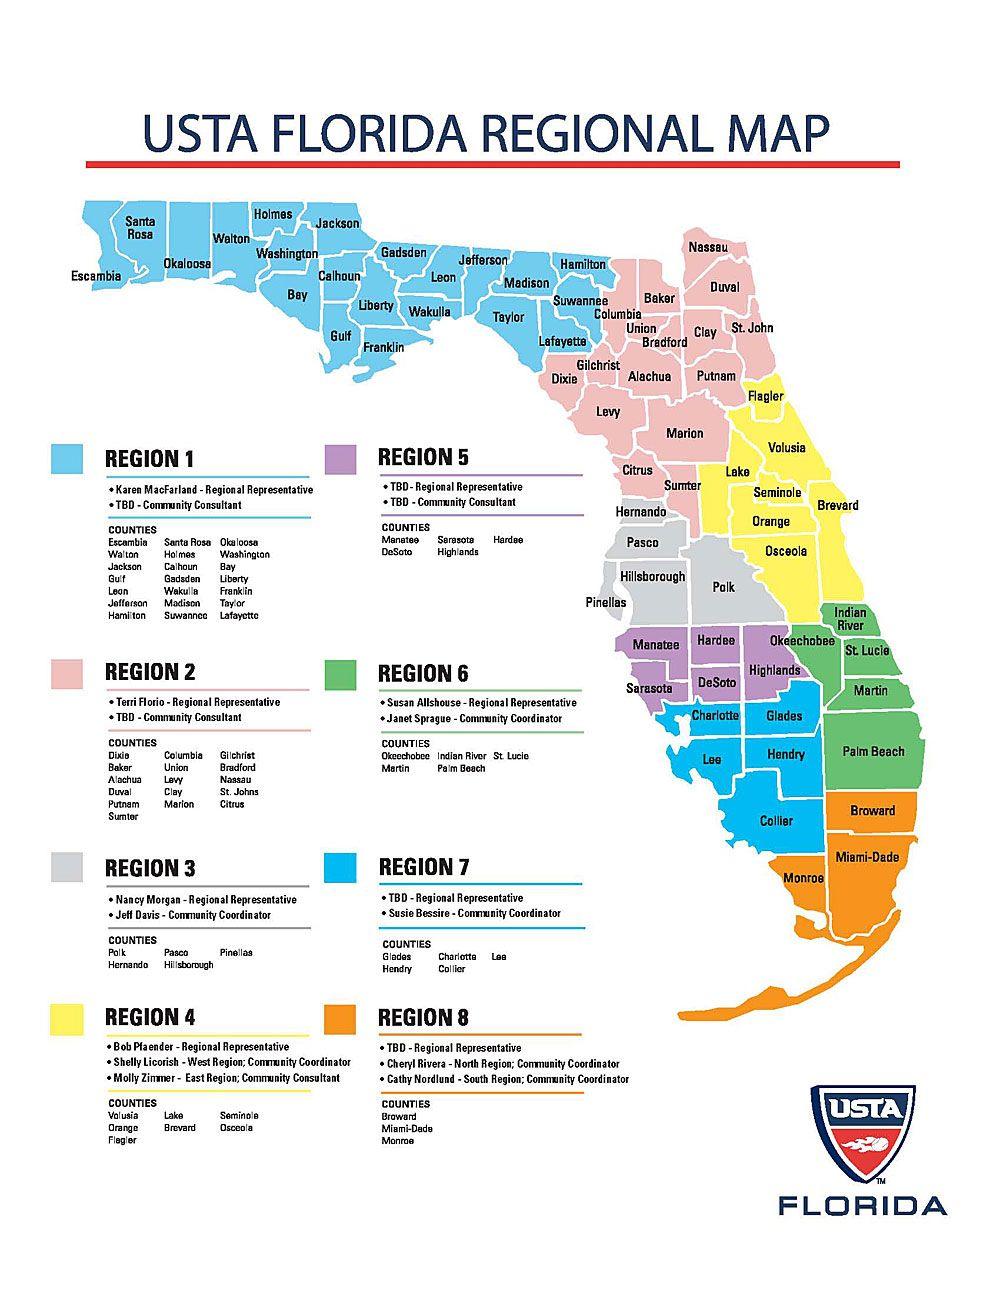 Florida Regions Map.Yearbook Usta Florida Yearbook Usta Florida